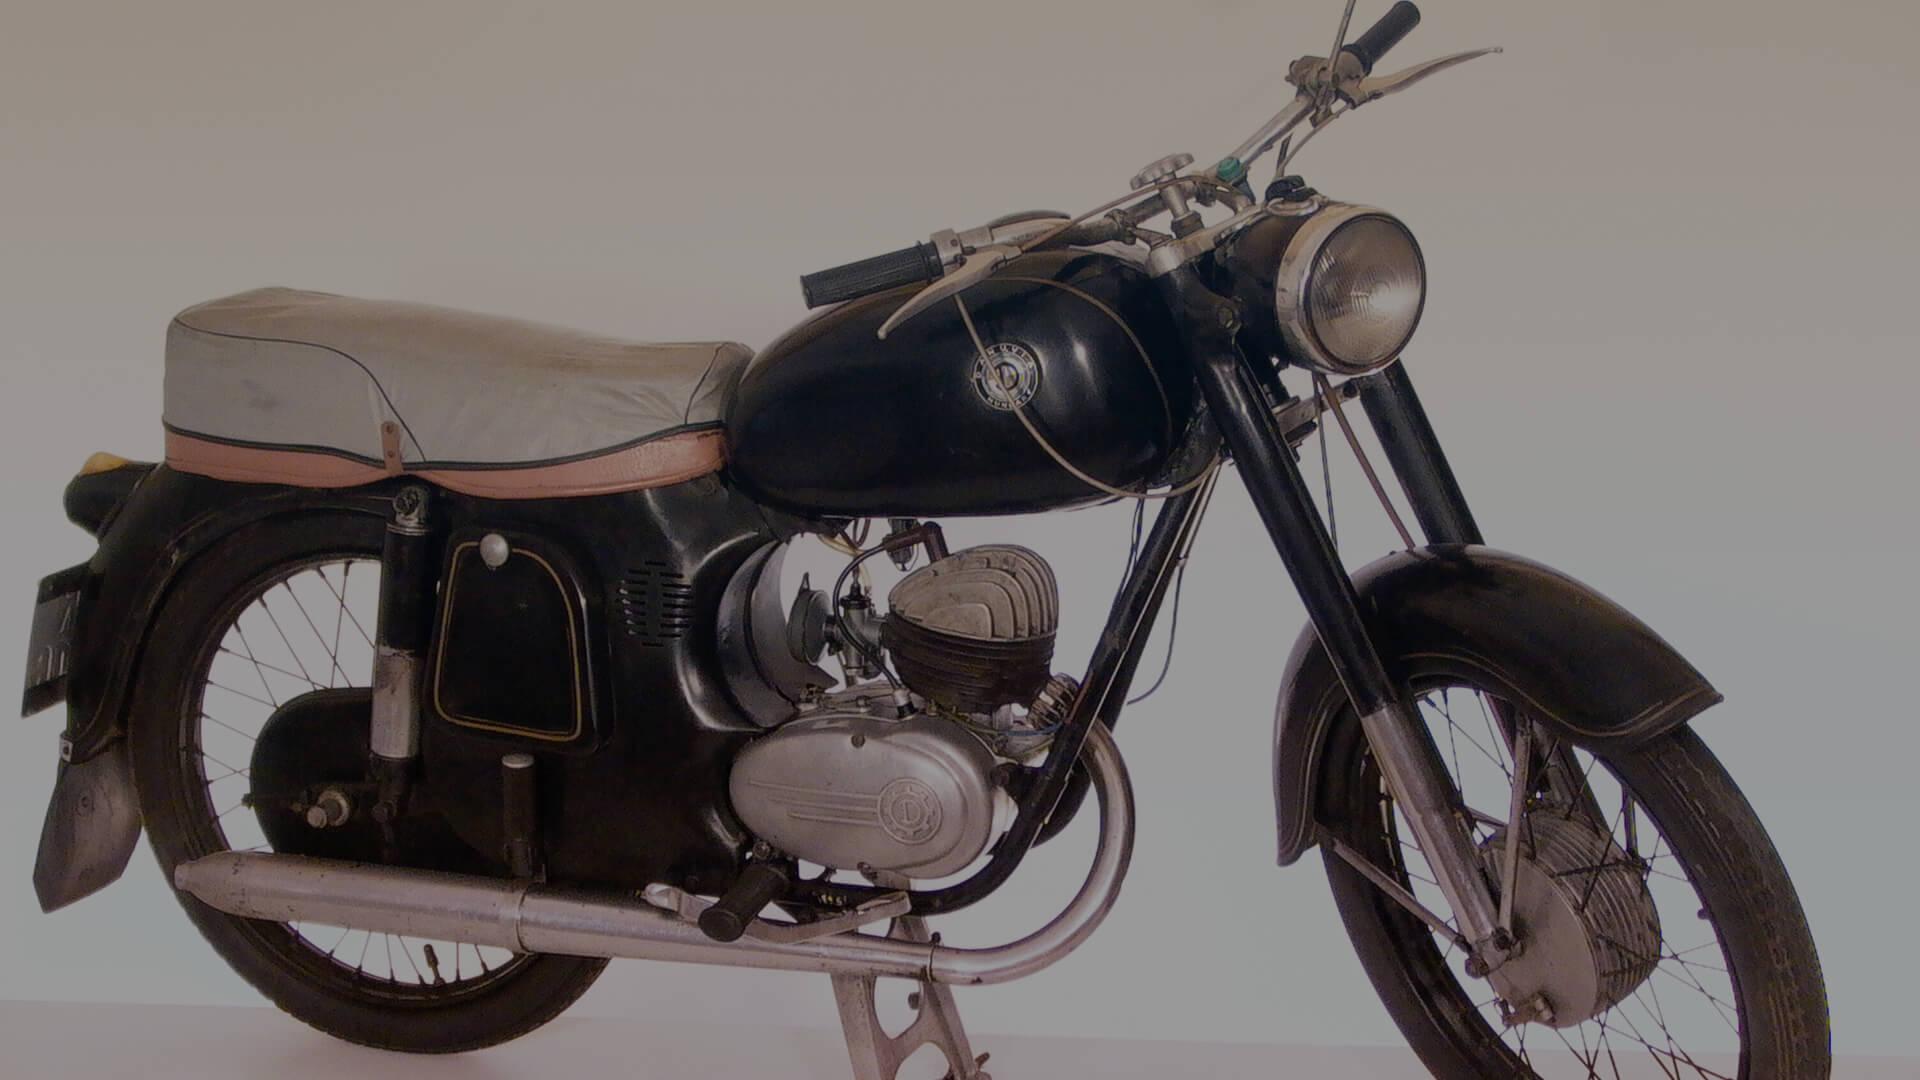 DANUVIA DV-125, 123 CC, 1959